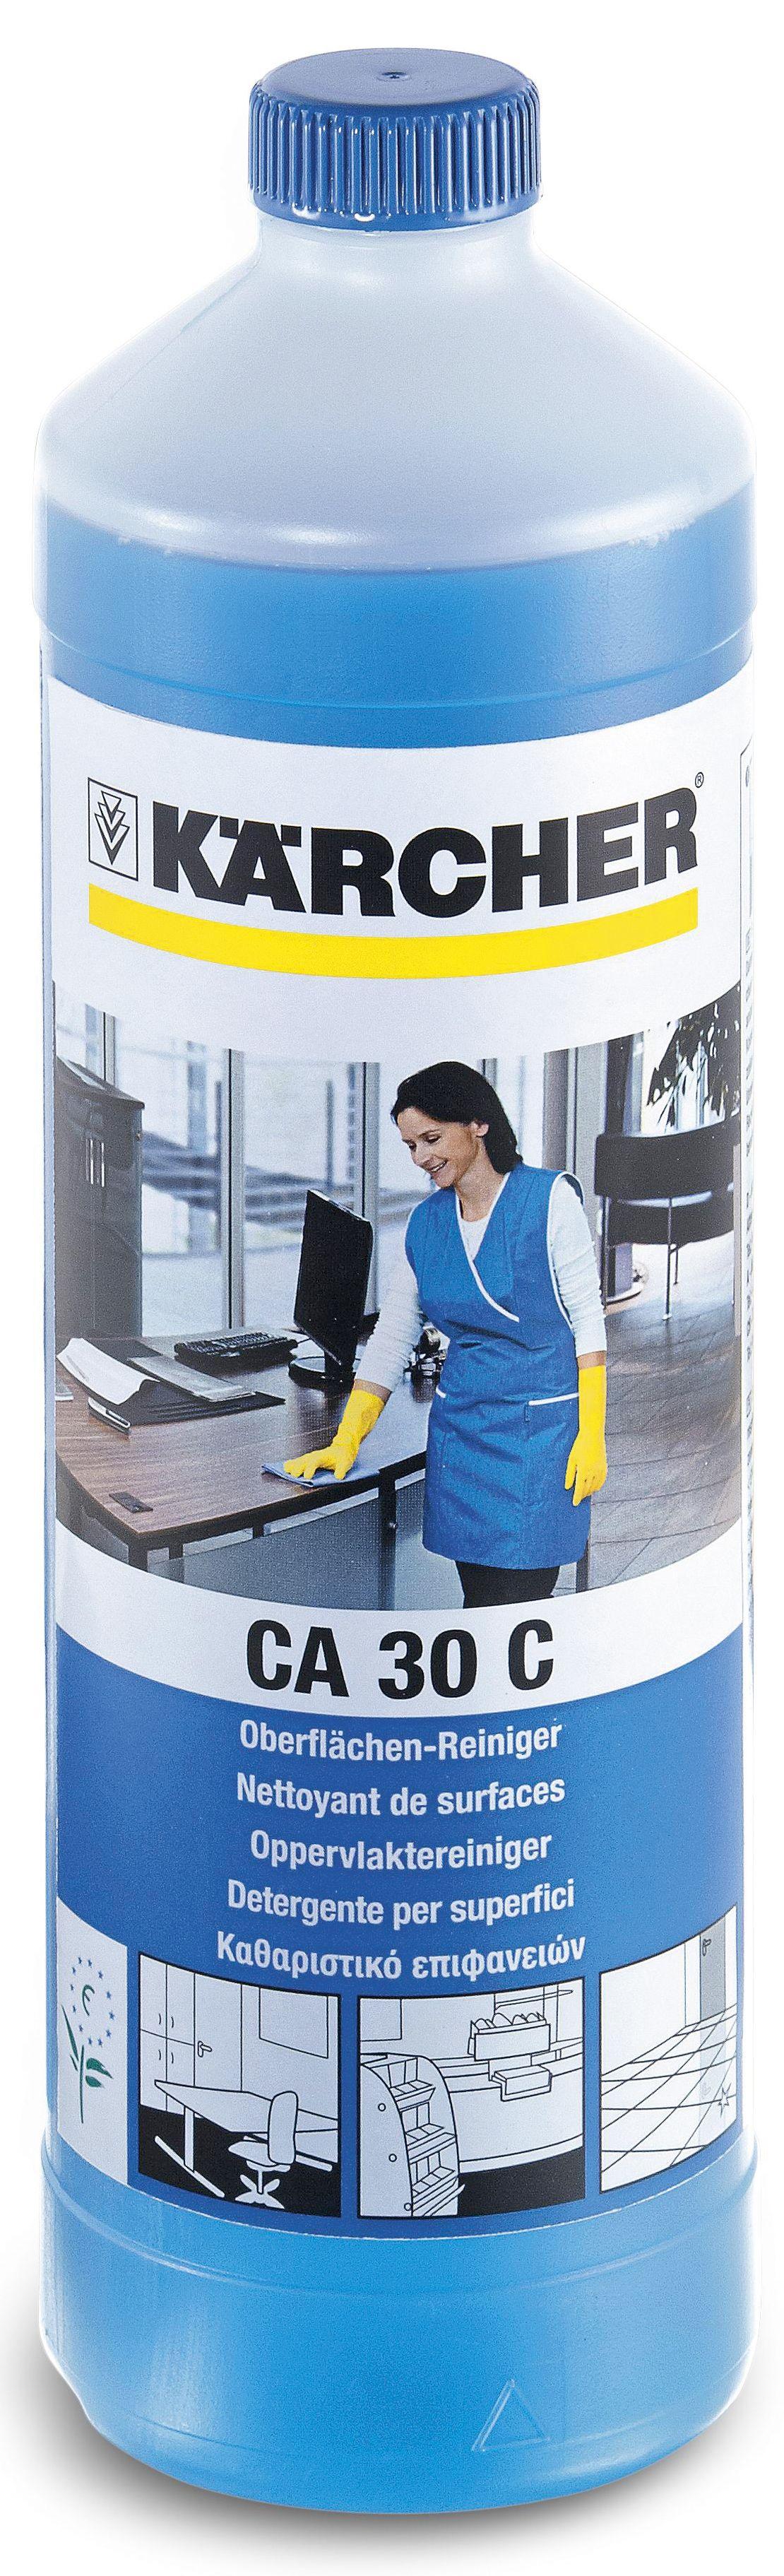 Kärcher Rengjøring CA 30 C 1L (flaske med 1 l) 6.295-699.0